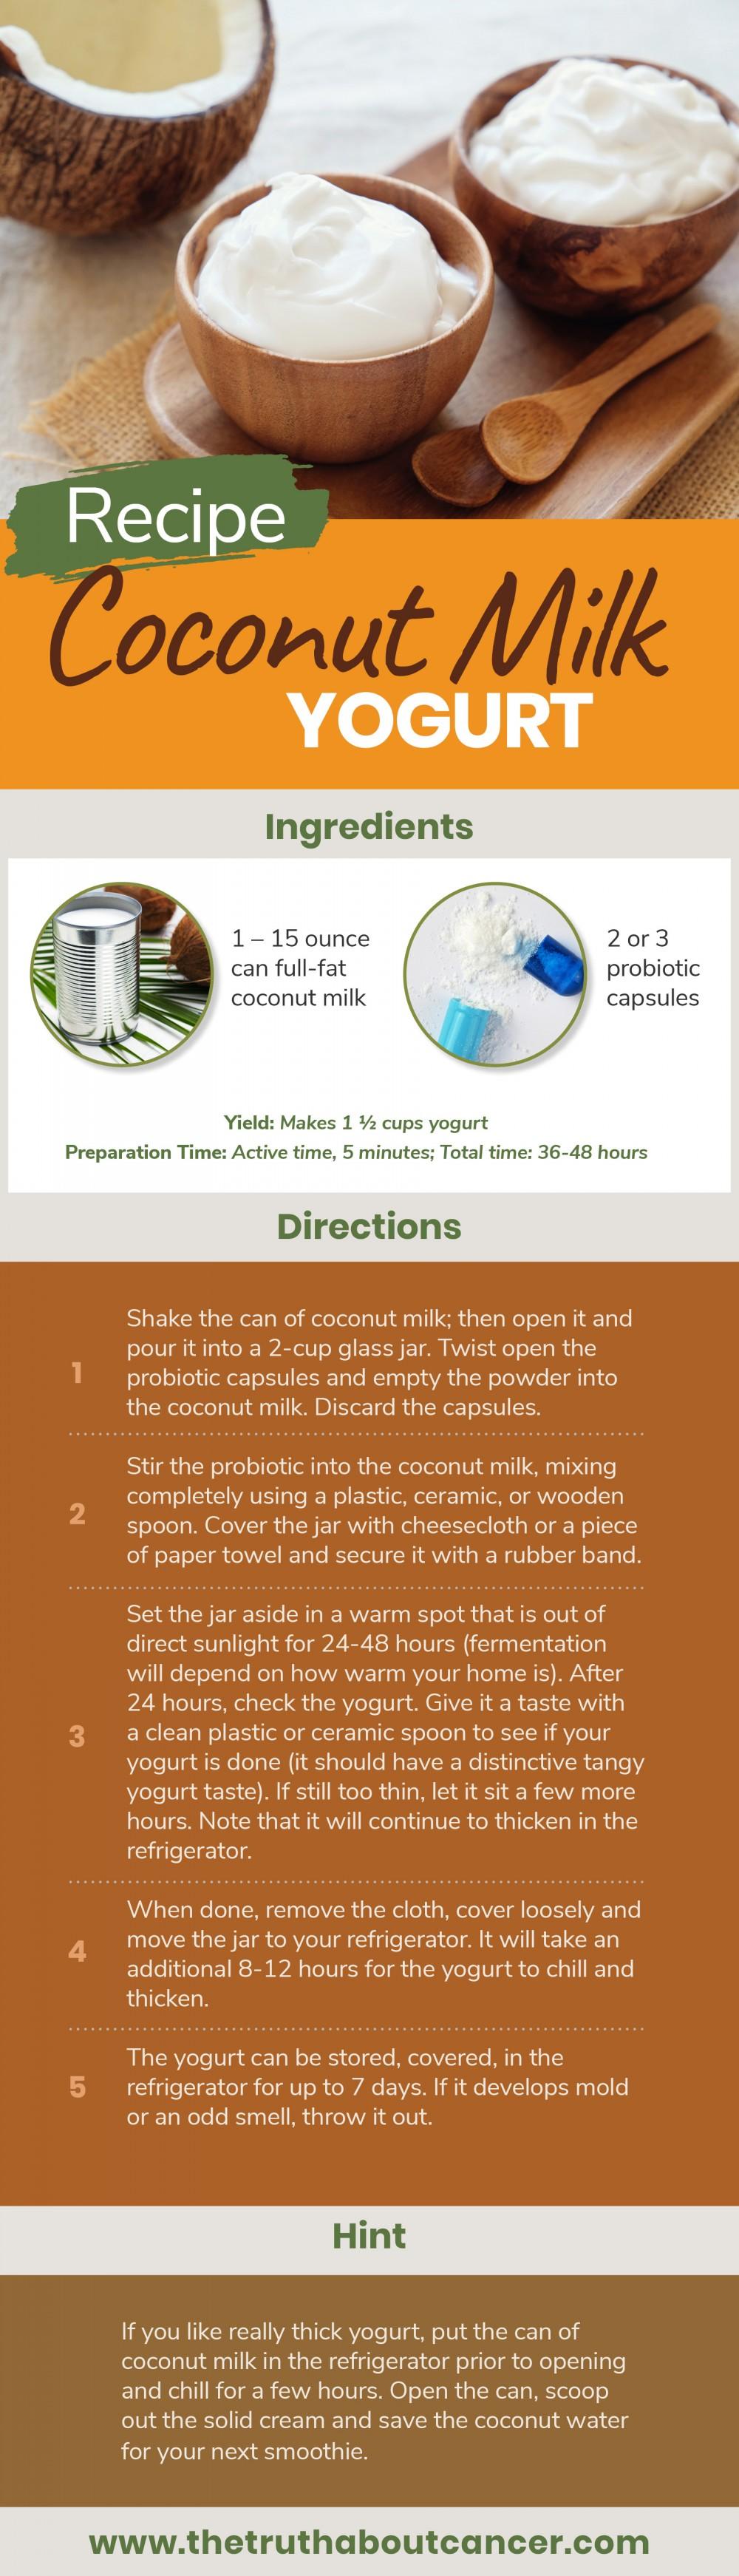 coconut yogurt infographic